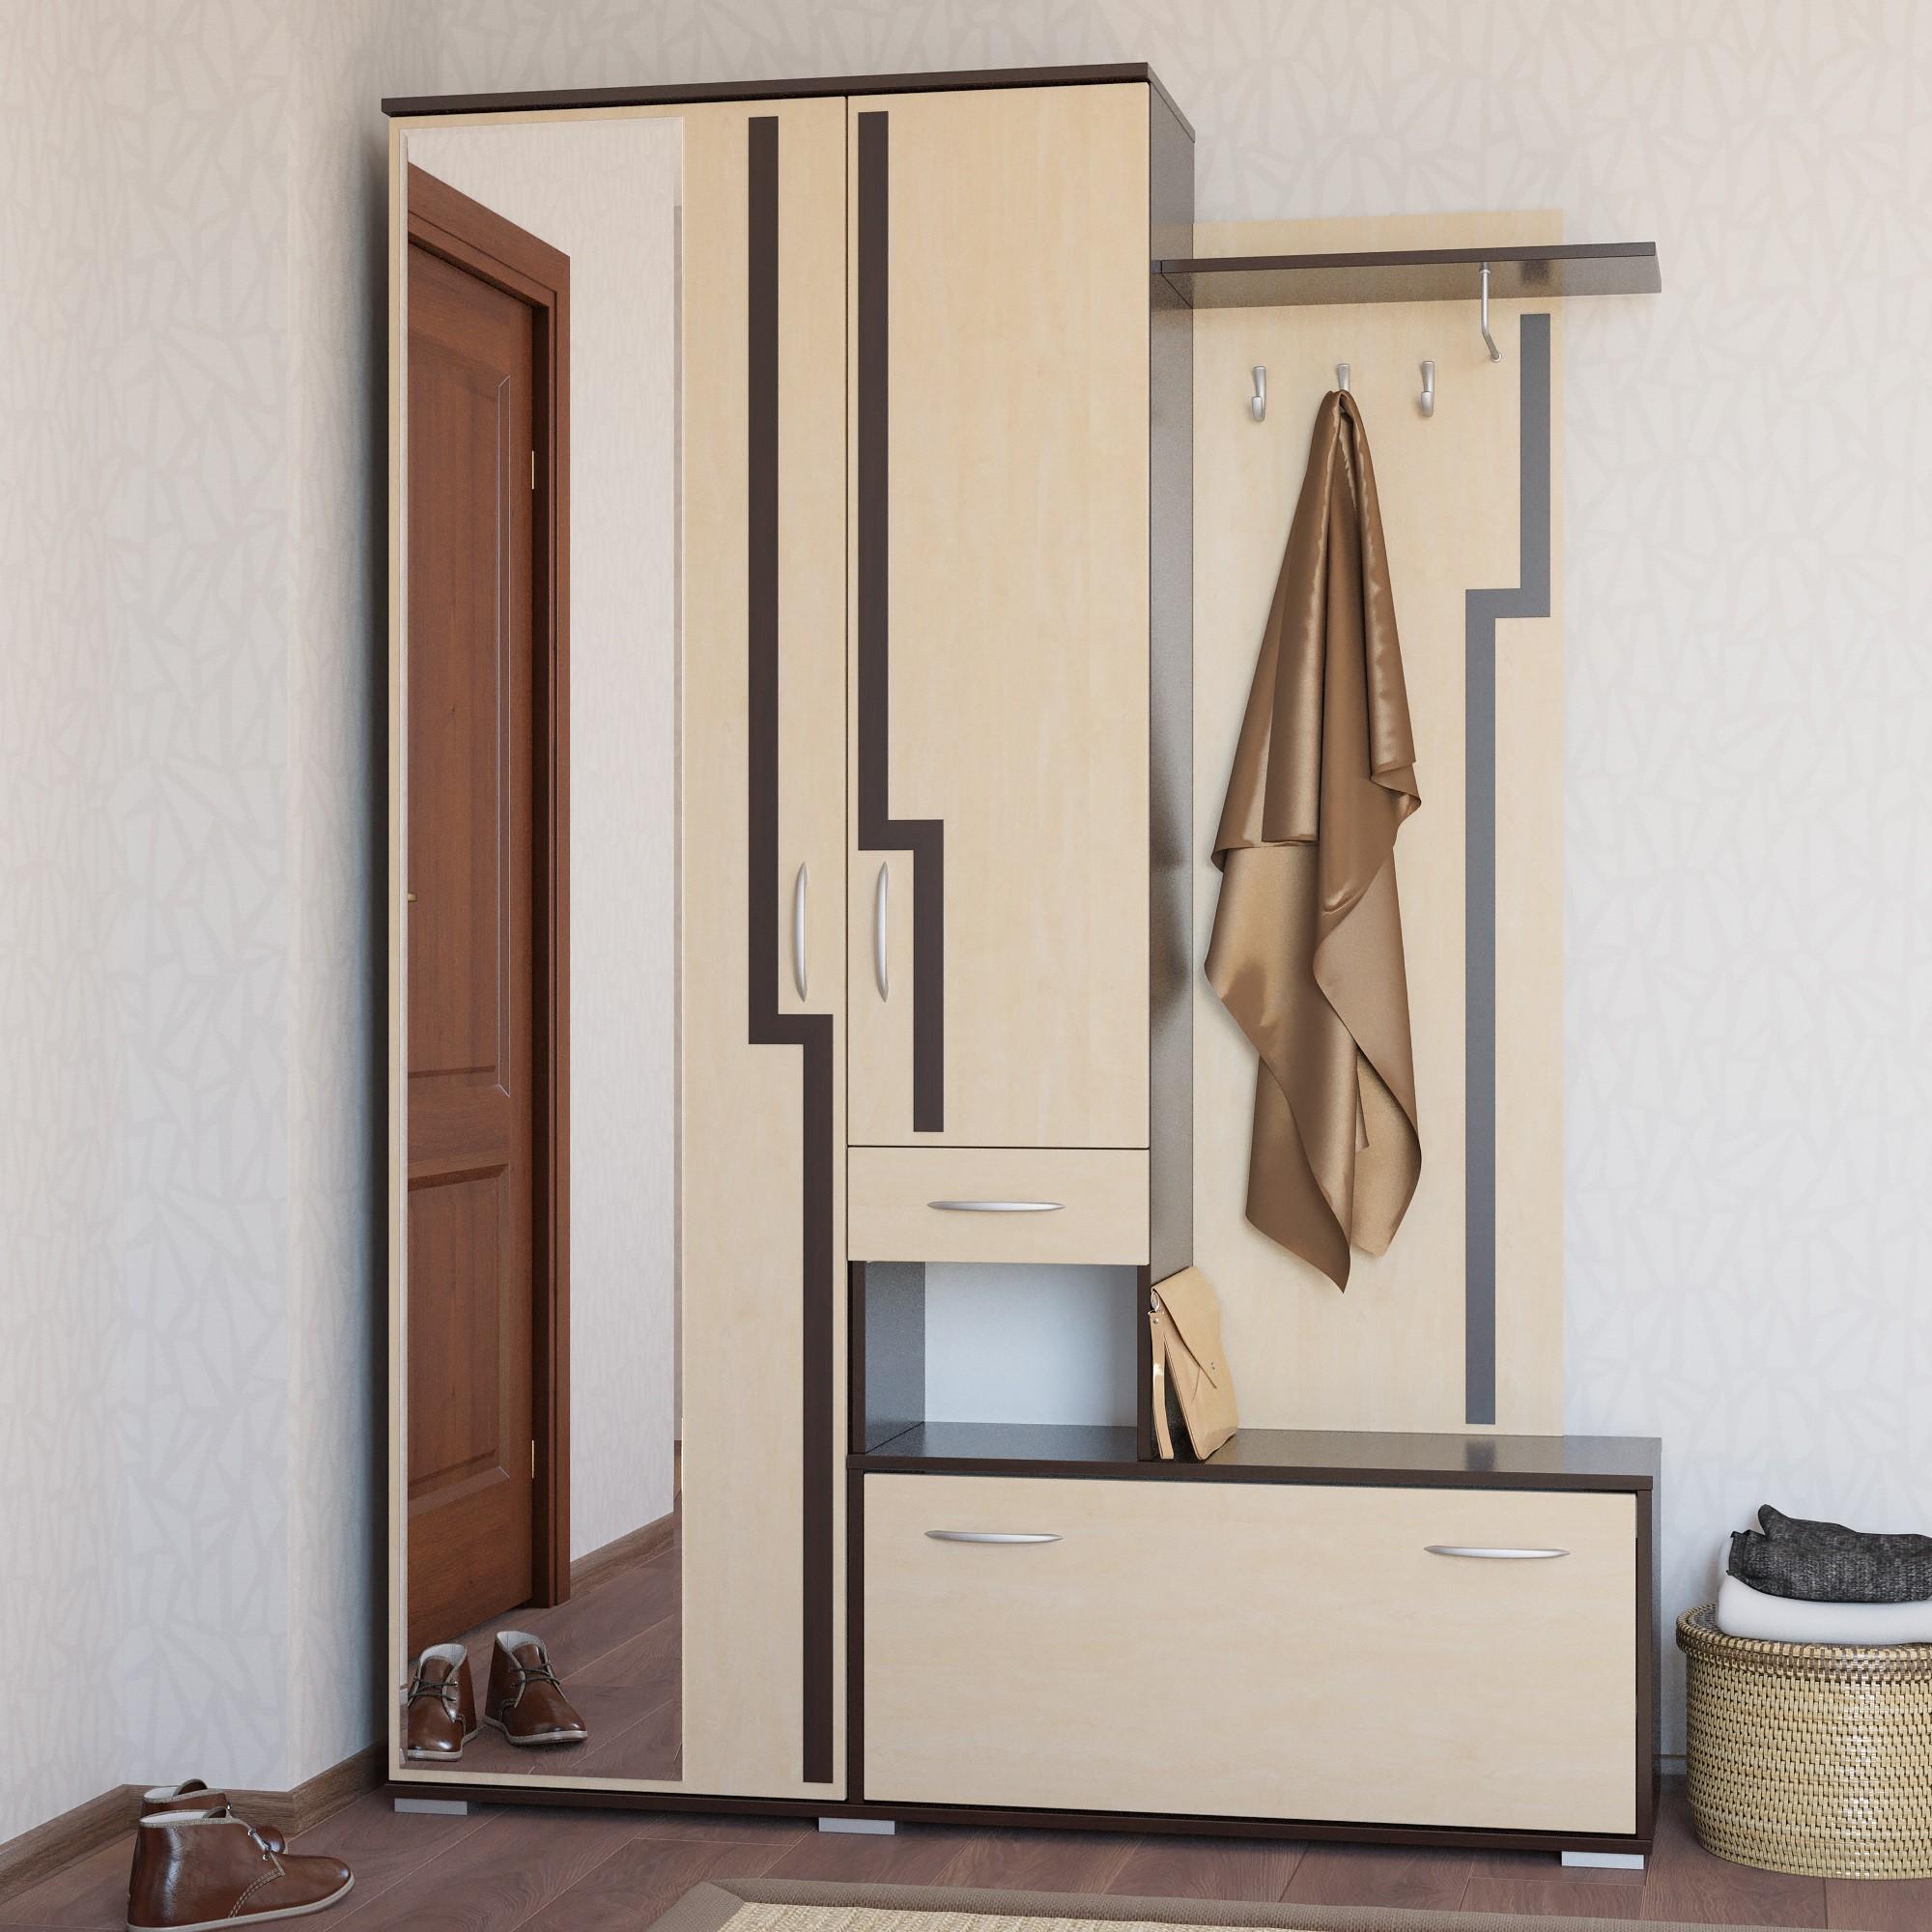 Прихожие мебель для узкого коридора фото